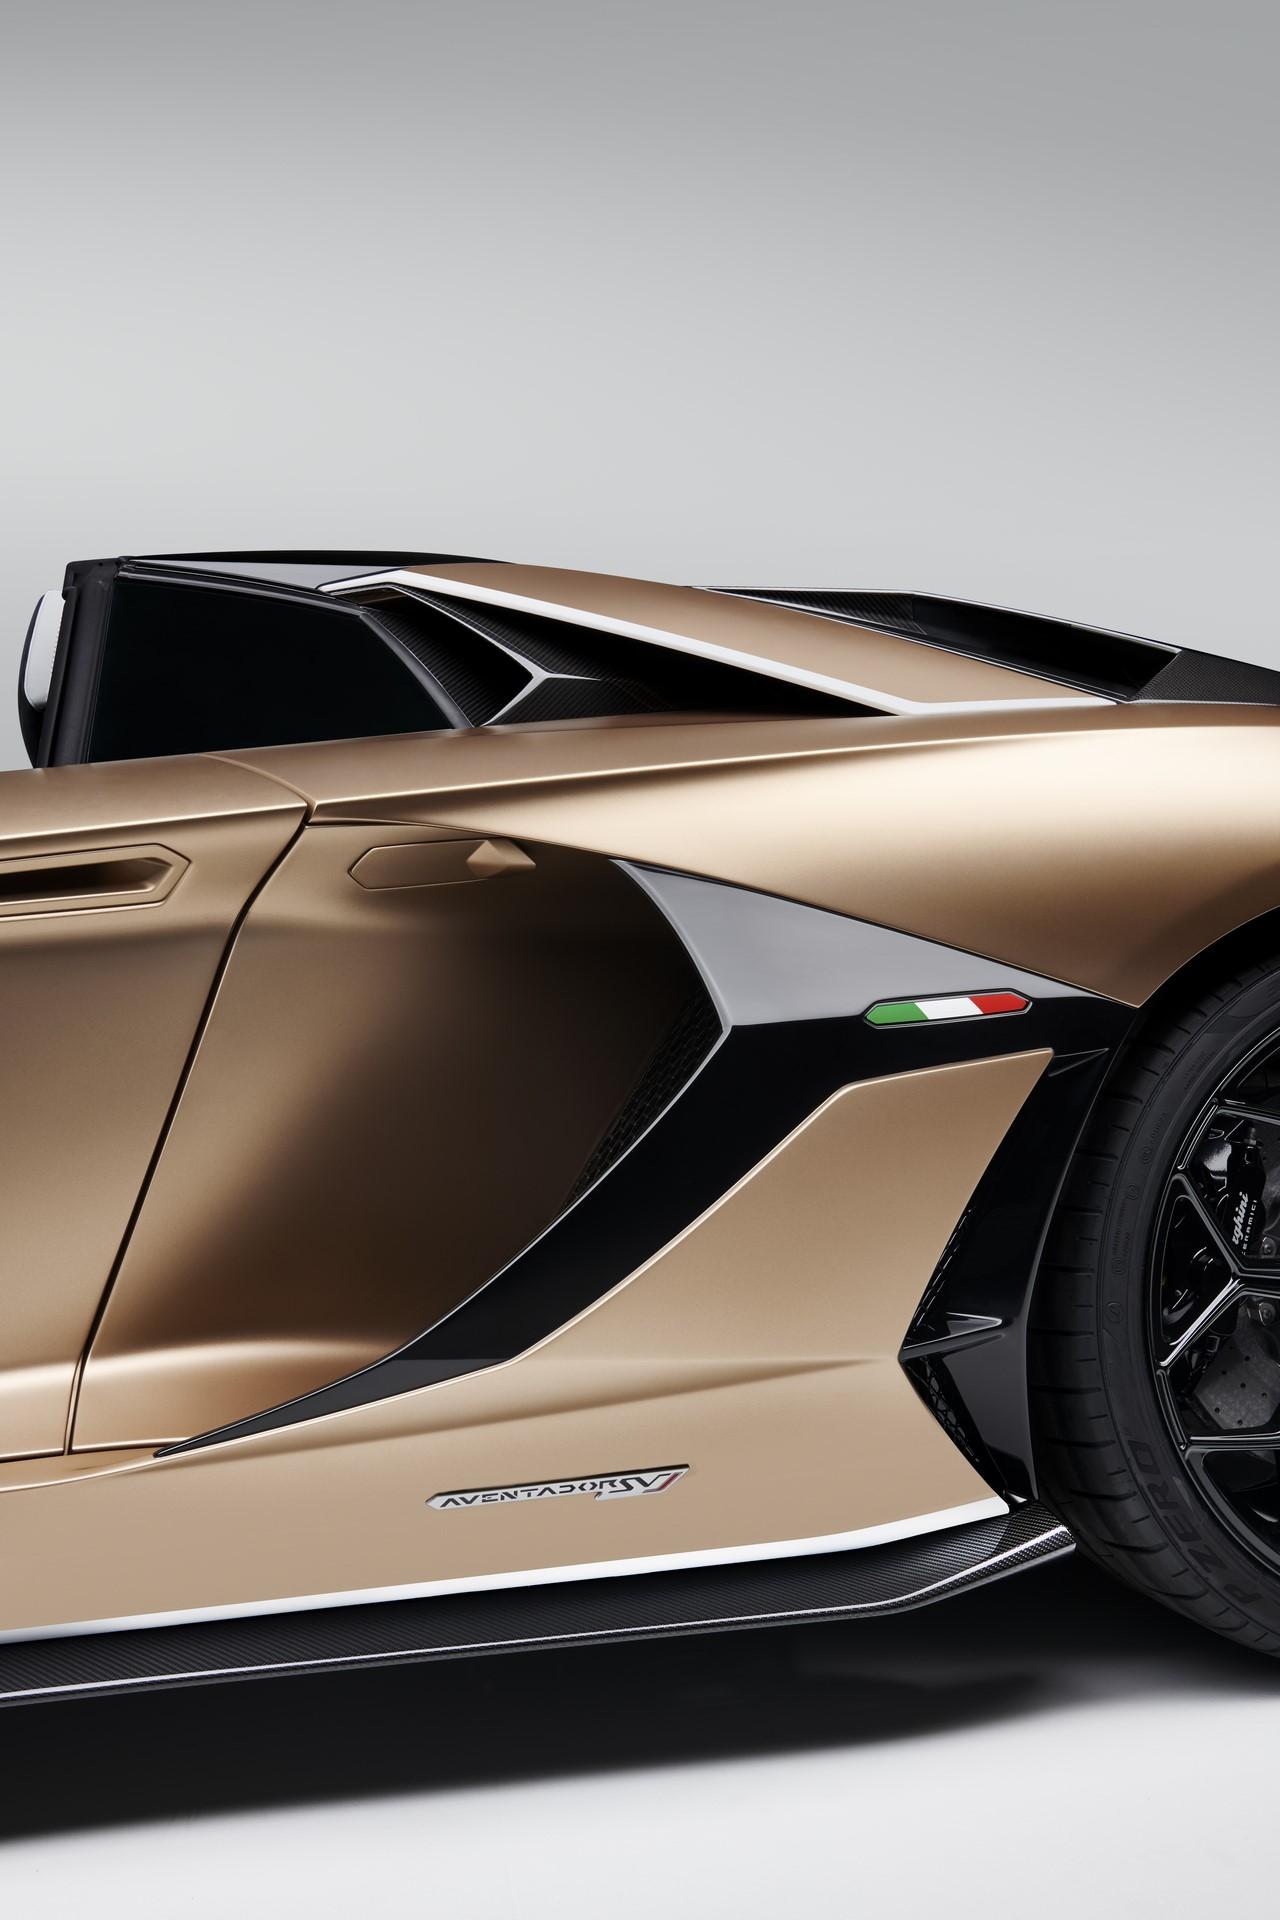 Lamborghini Aventador SVJ Roadster (30)